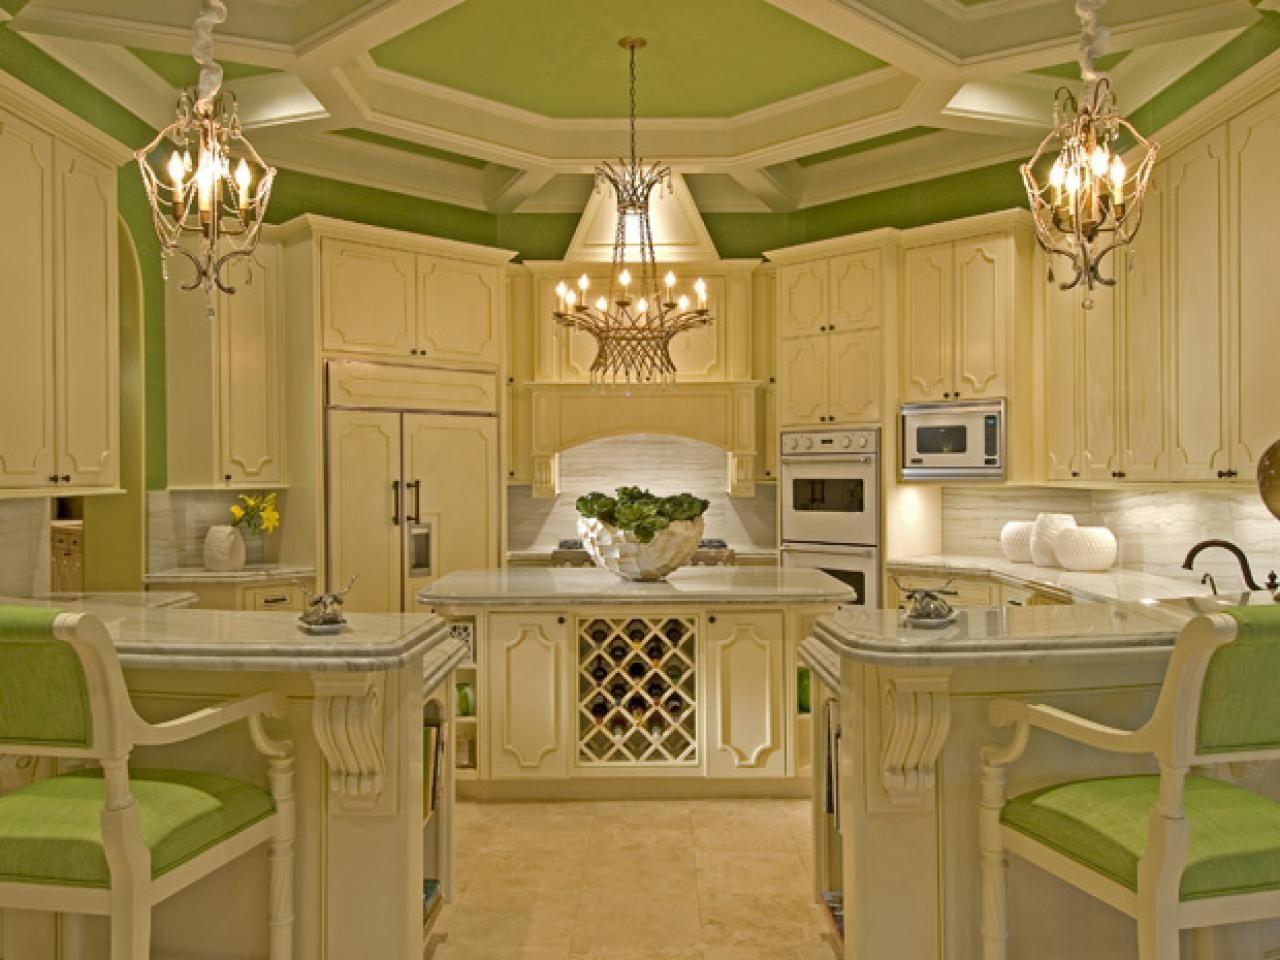 Colorful Kitchens | Green walls, Hgtv and Kitchens